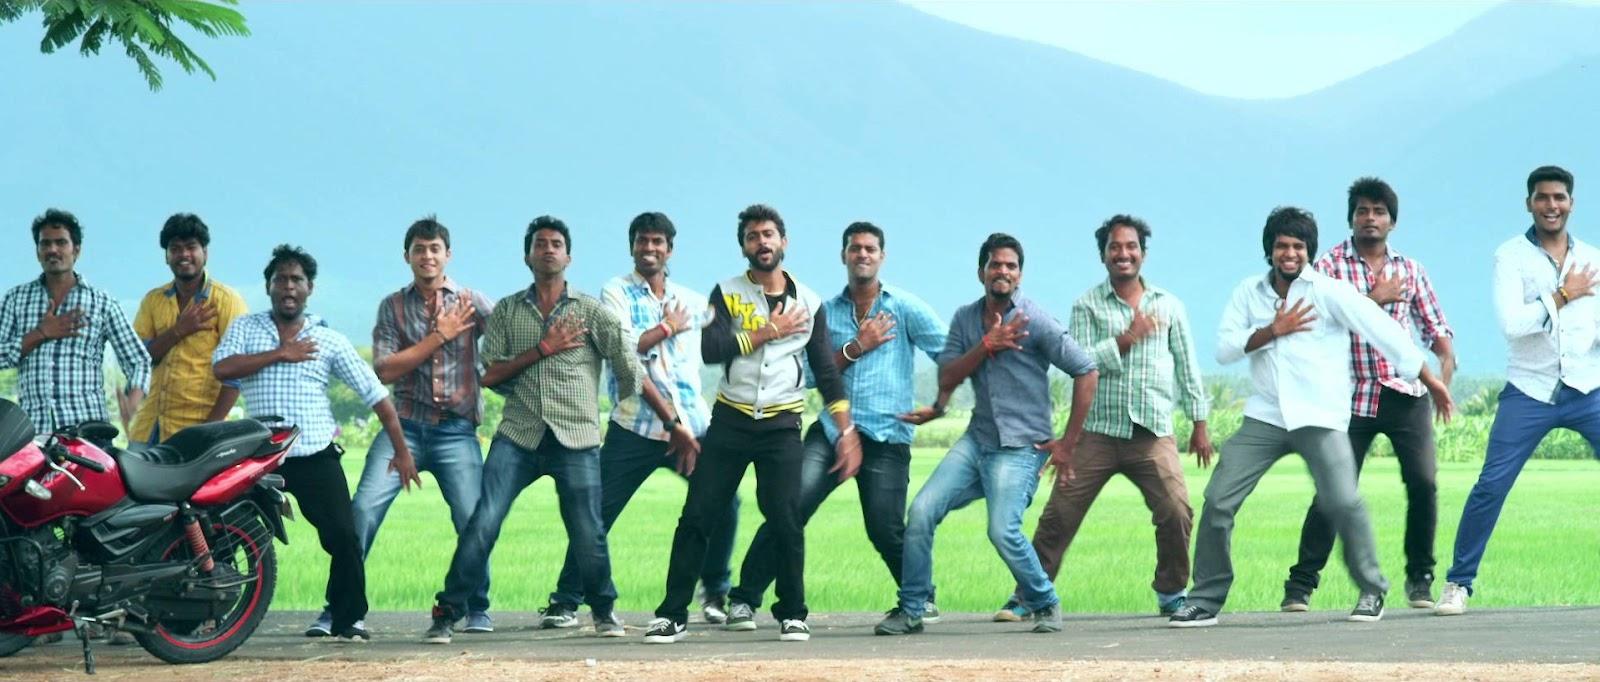 Dhillu Dhillu Song Teaser _ Kaadhal Kaalam Tamil Film _ S. Jeyananthan